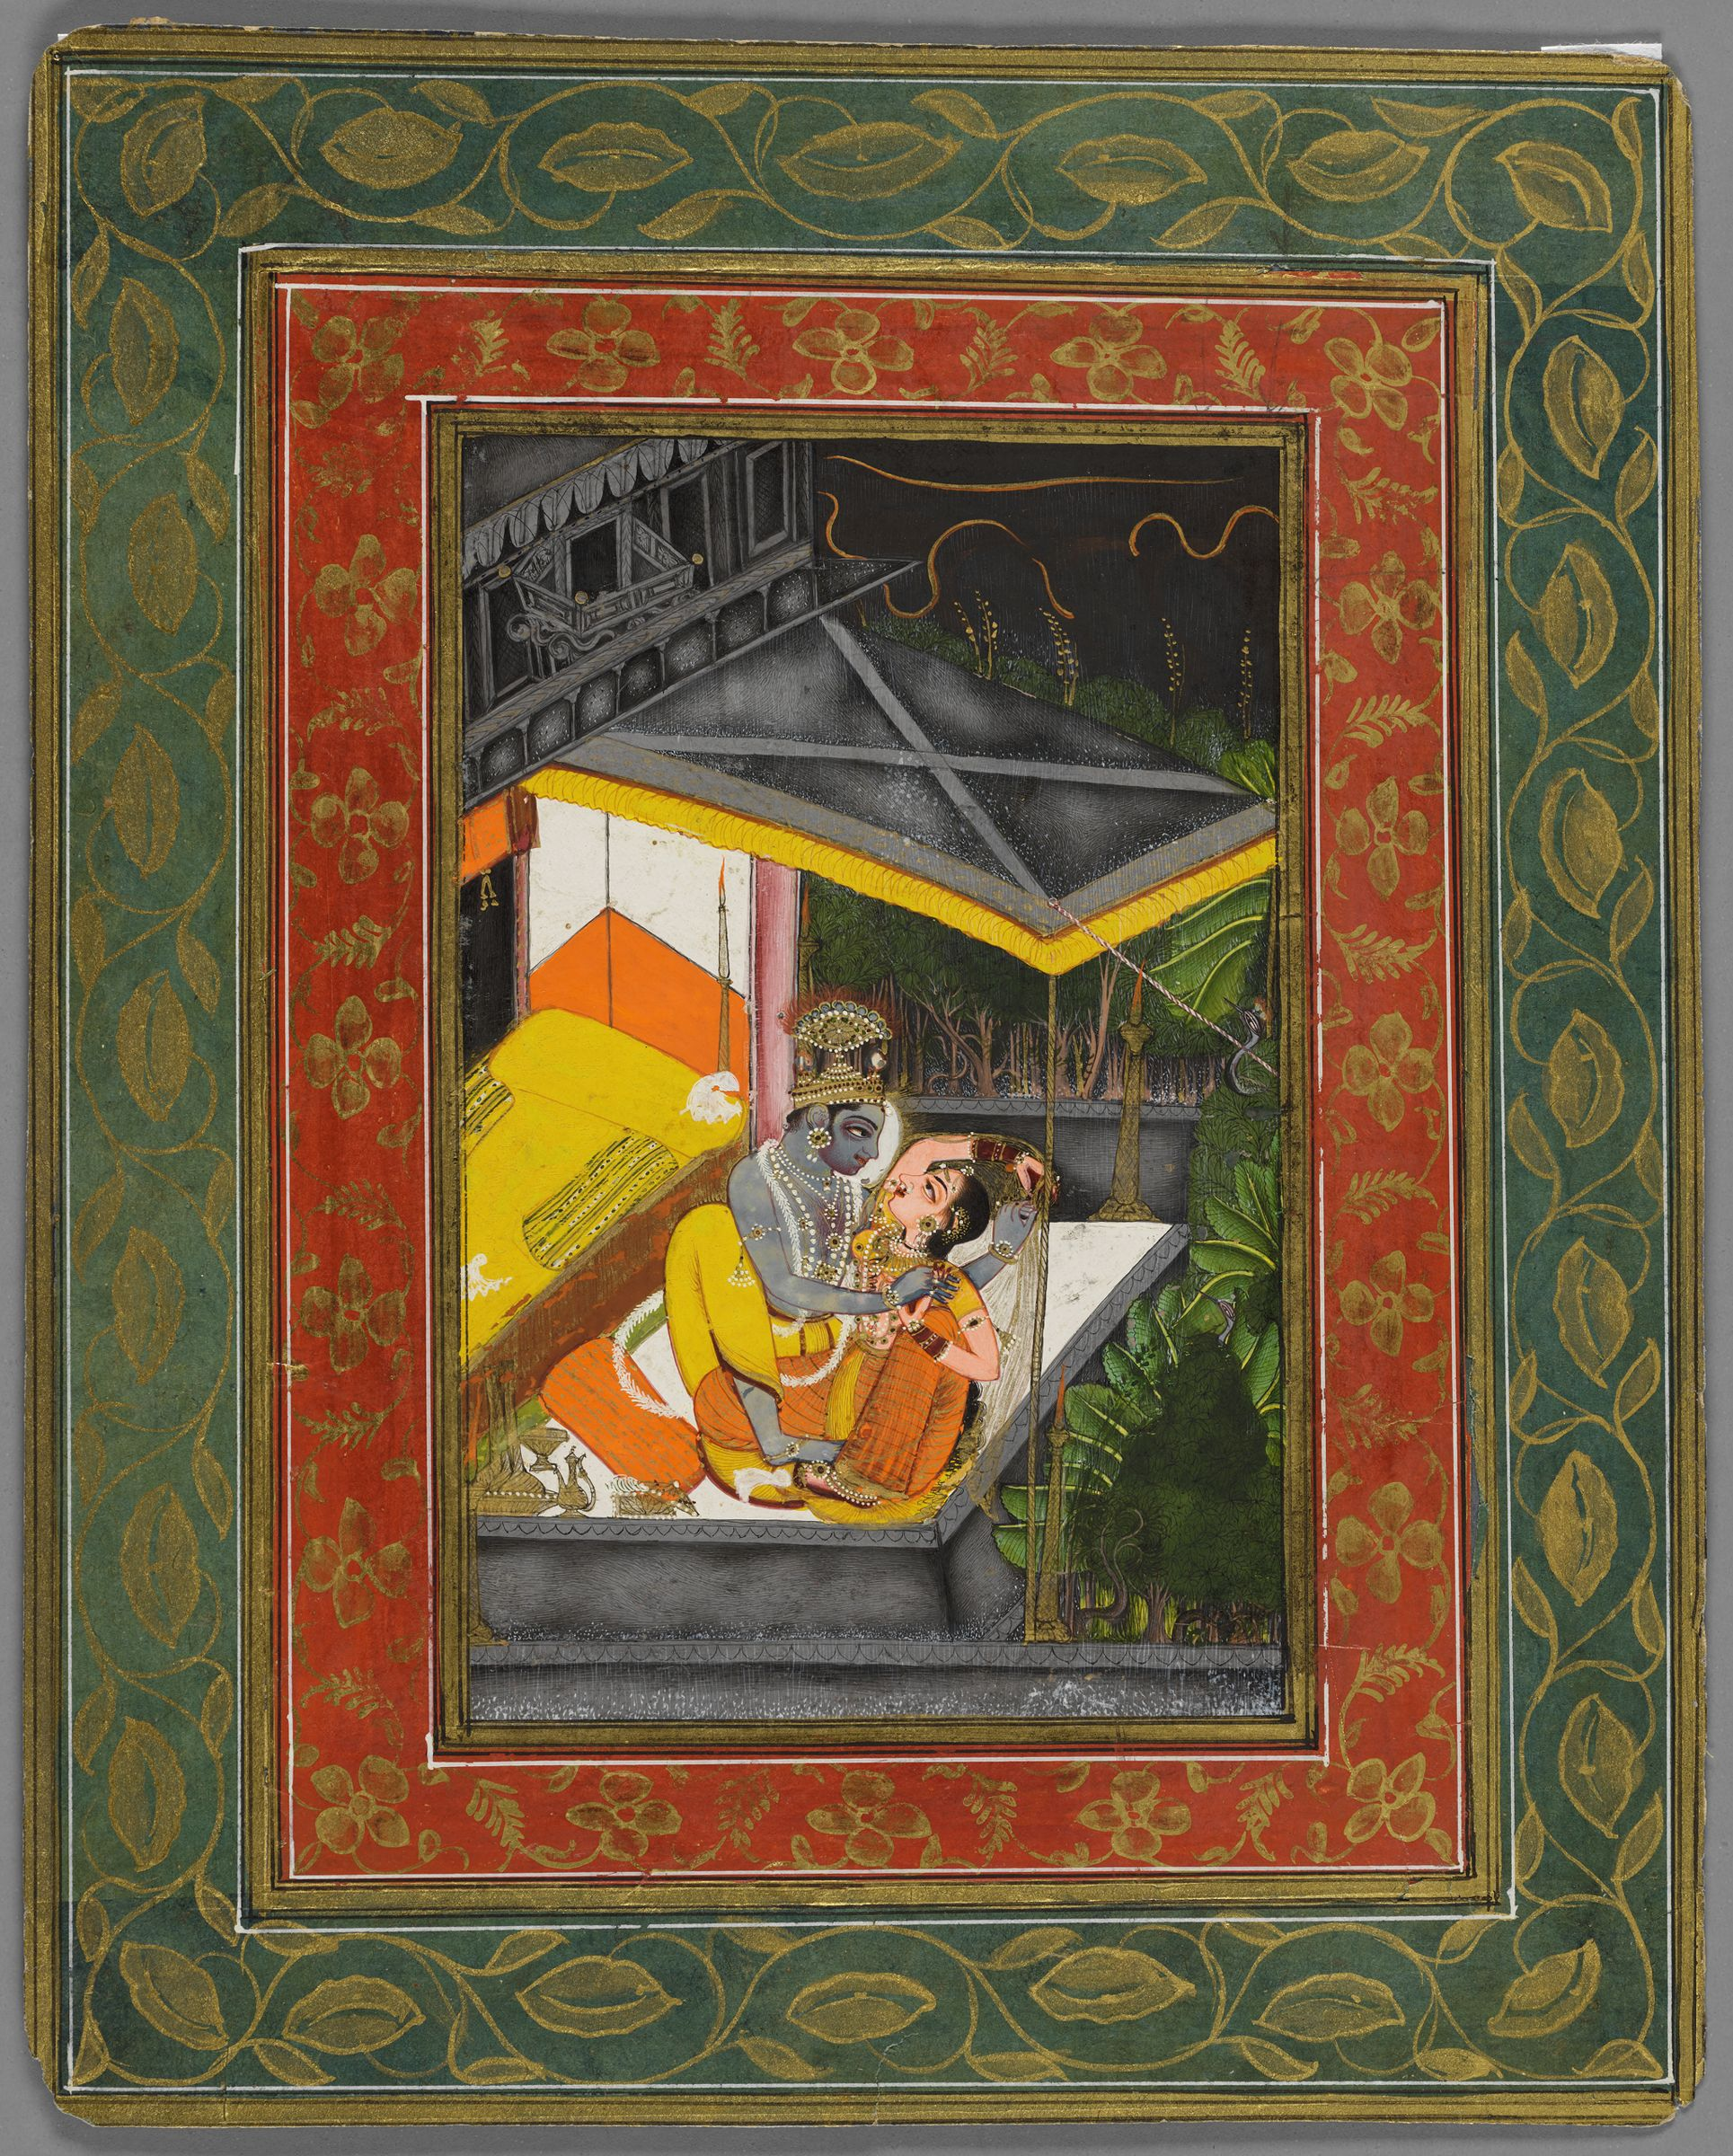 Krishna And Radha Embrace During A Storm (Recto); Priests Worship Shrinathji (Verso); Folio From A Royal Kota-Jaipur Album